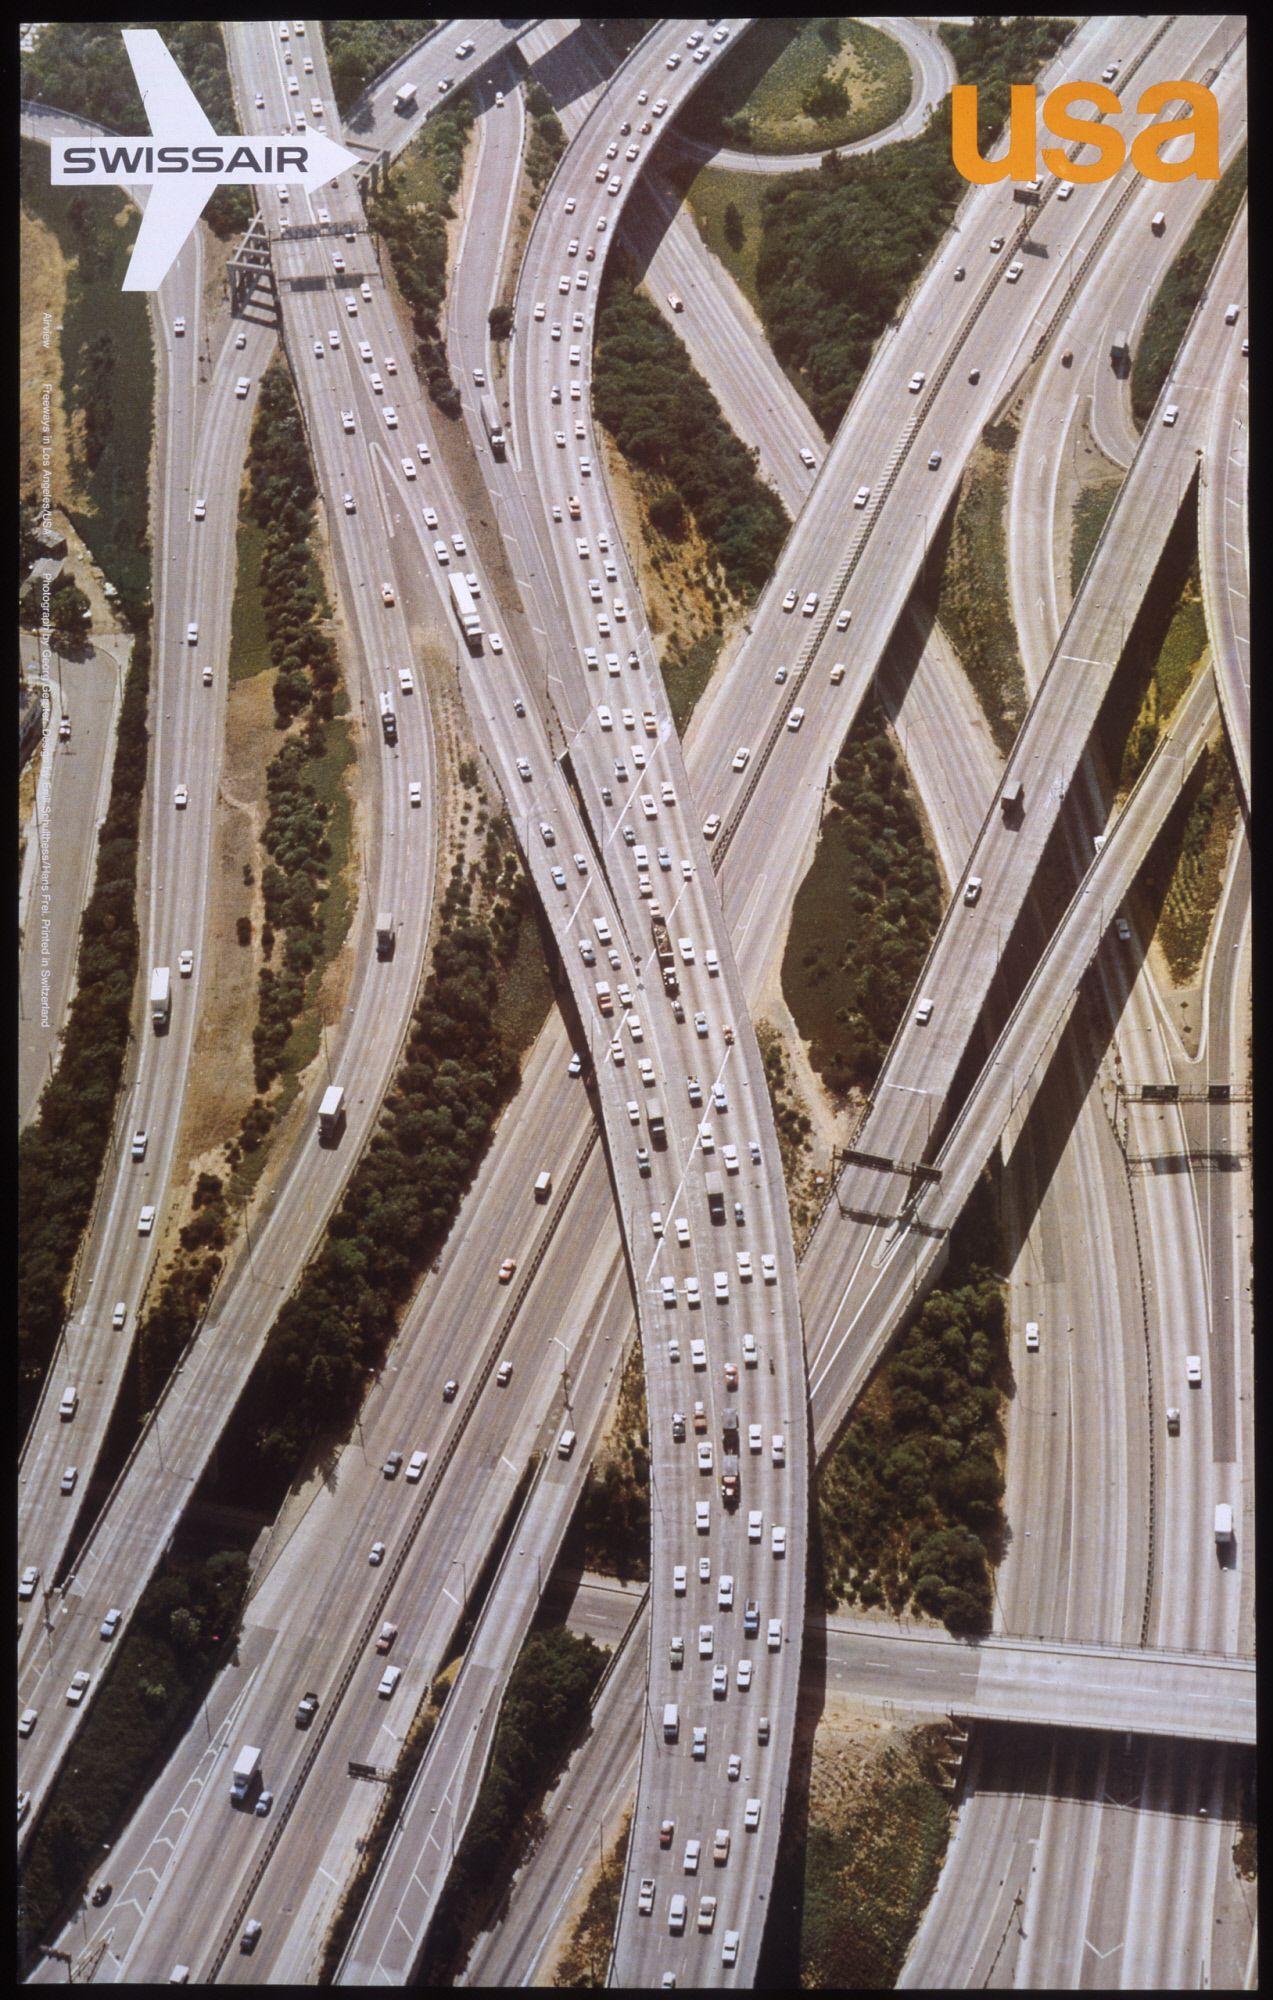 Swissair USA 1972  Los Angeles freeway system; landscape with Swissair logo